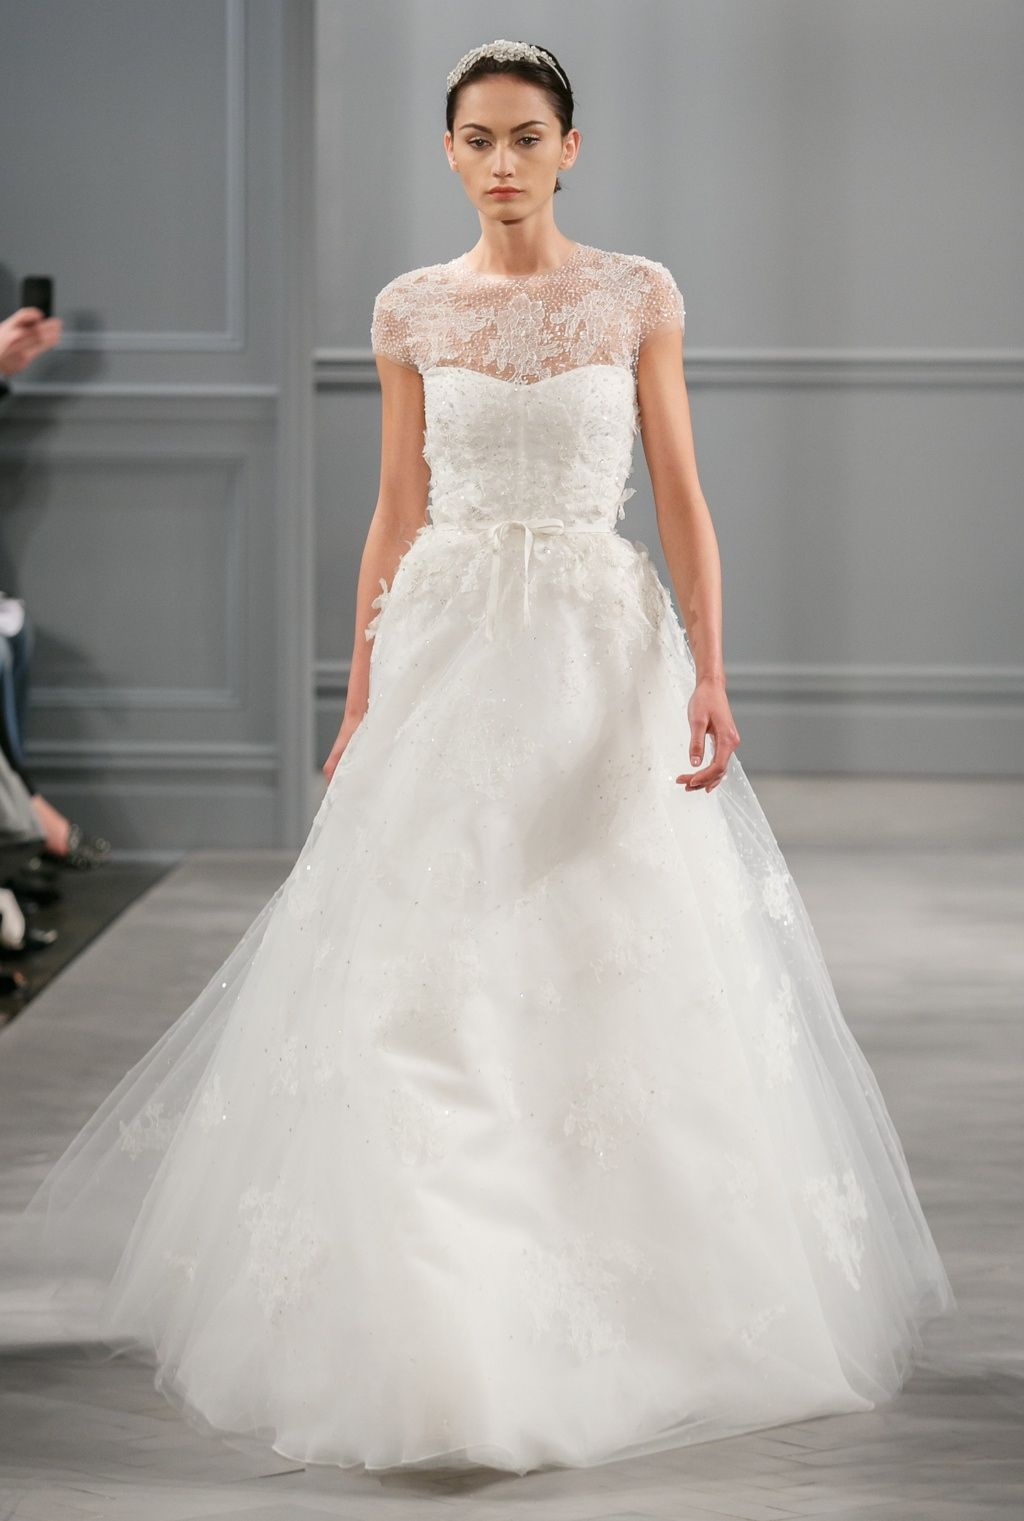 Pin By Annora On Popular Wedding Dress Wedding Dresses Bridal